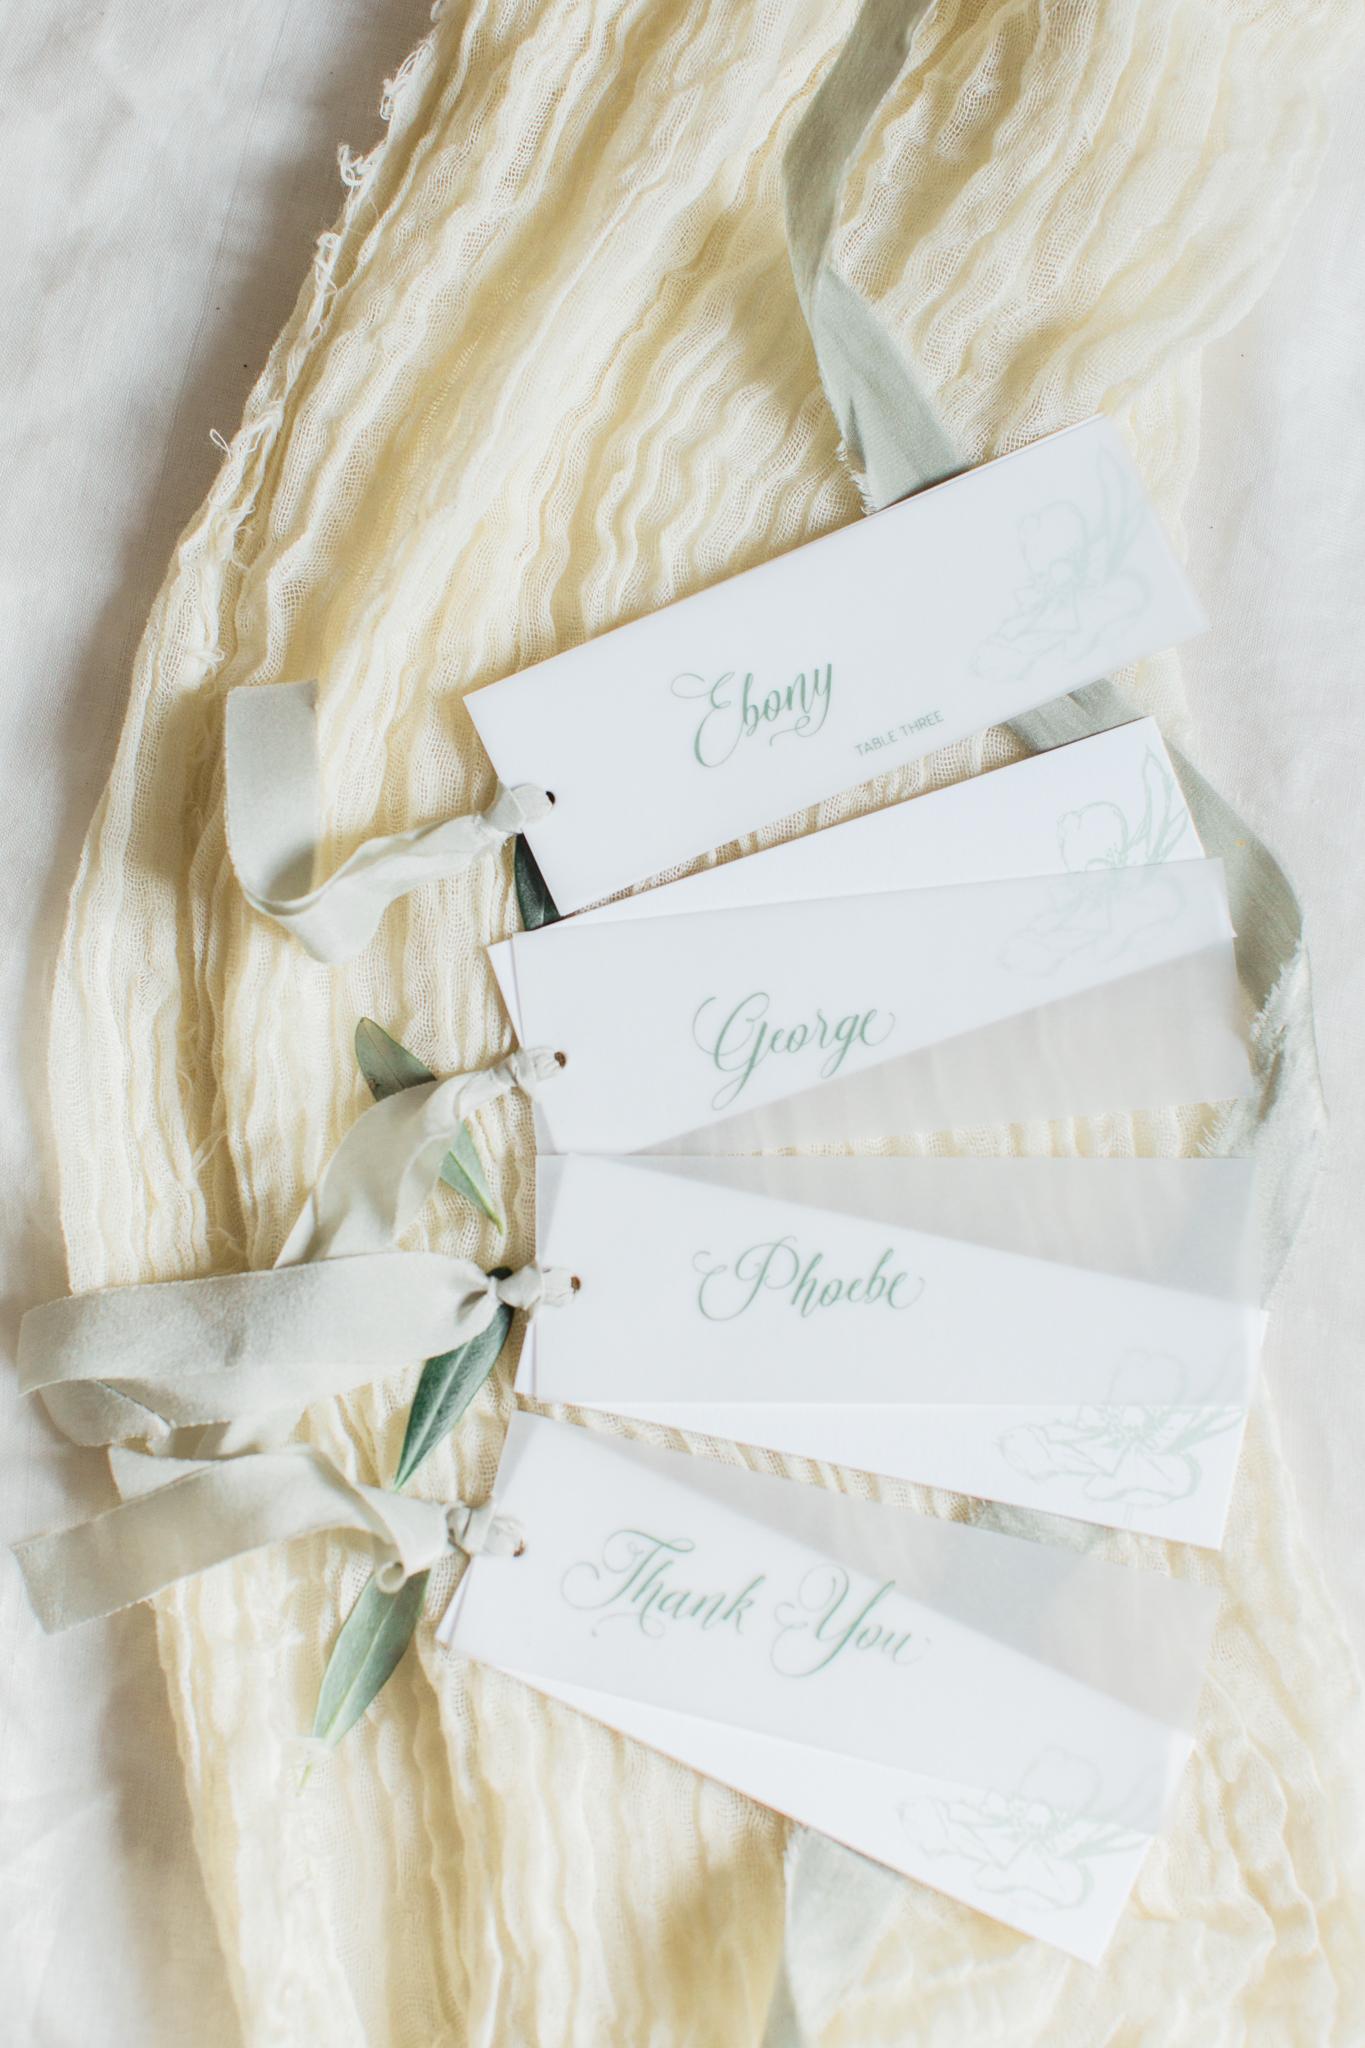 Inkflower Press Anemone silkscreen printed wedding place cards - Verdigris